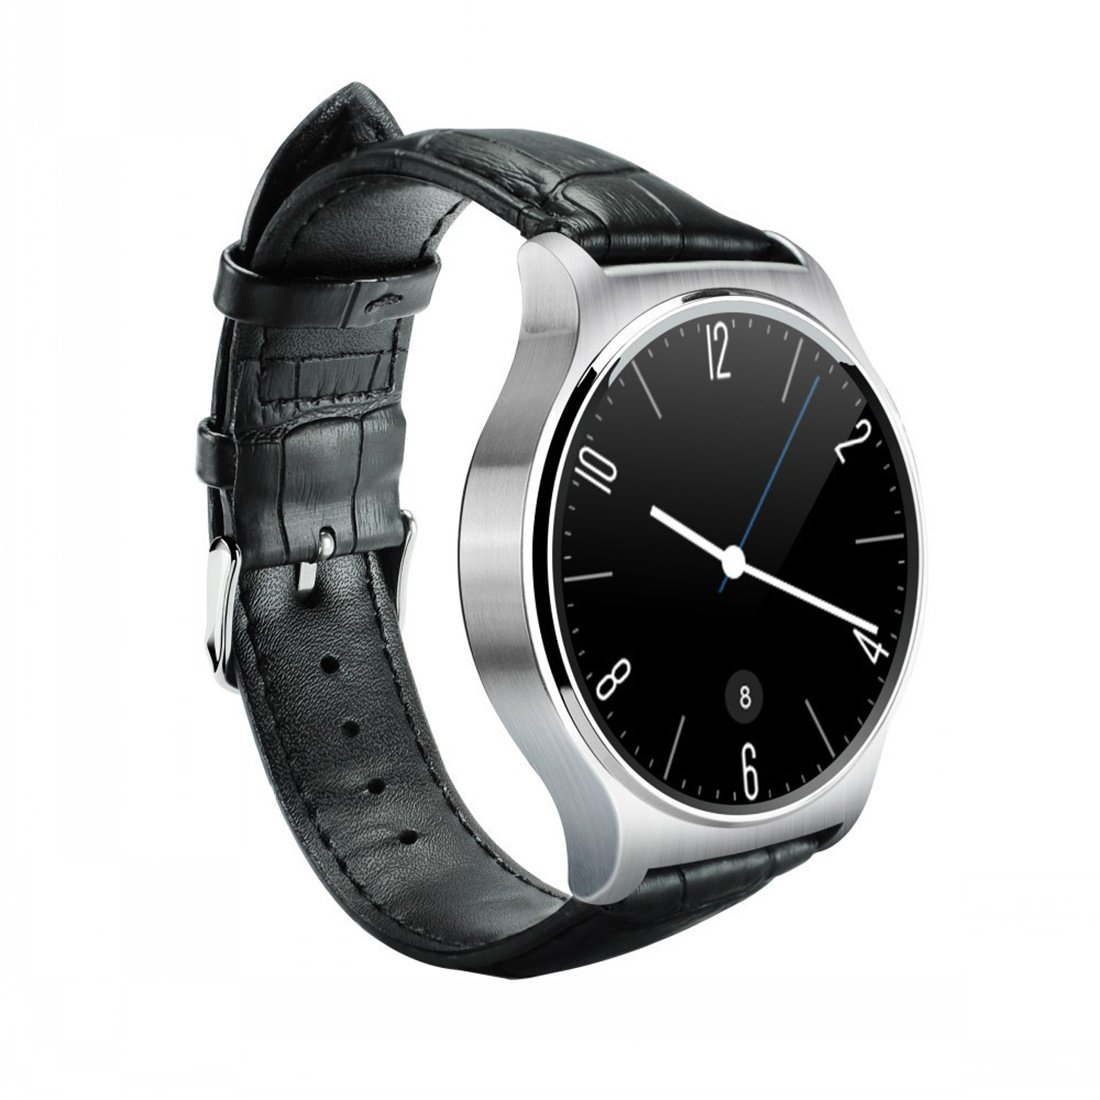 Amazon.com: PINCHU GW02 Bluetooth Smart Watch IPS Round ...